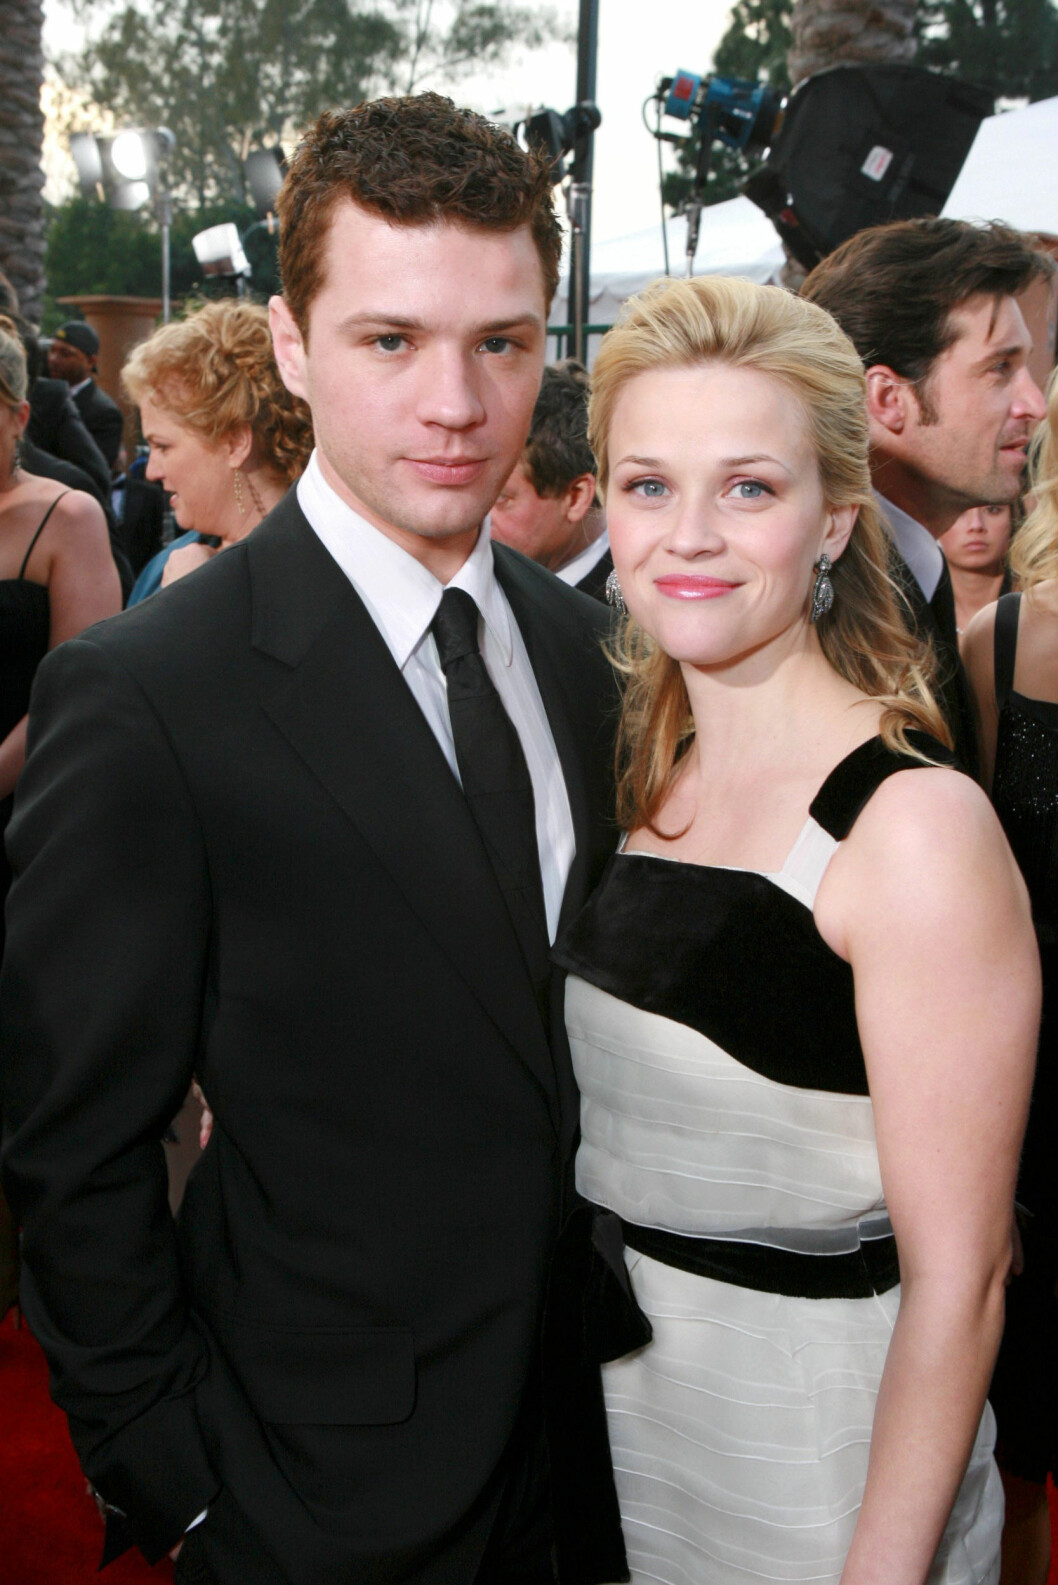 BRUDD ETTER OSCAR: Ryan Phillippe og Reese Witherspoon. Foto: All Over Press